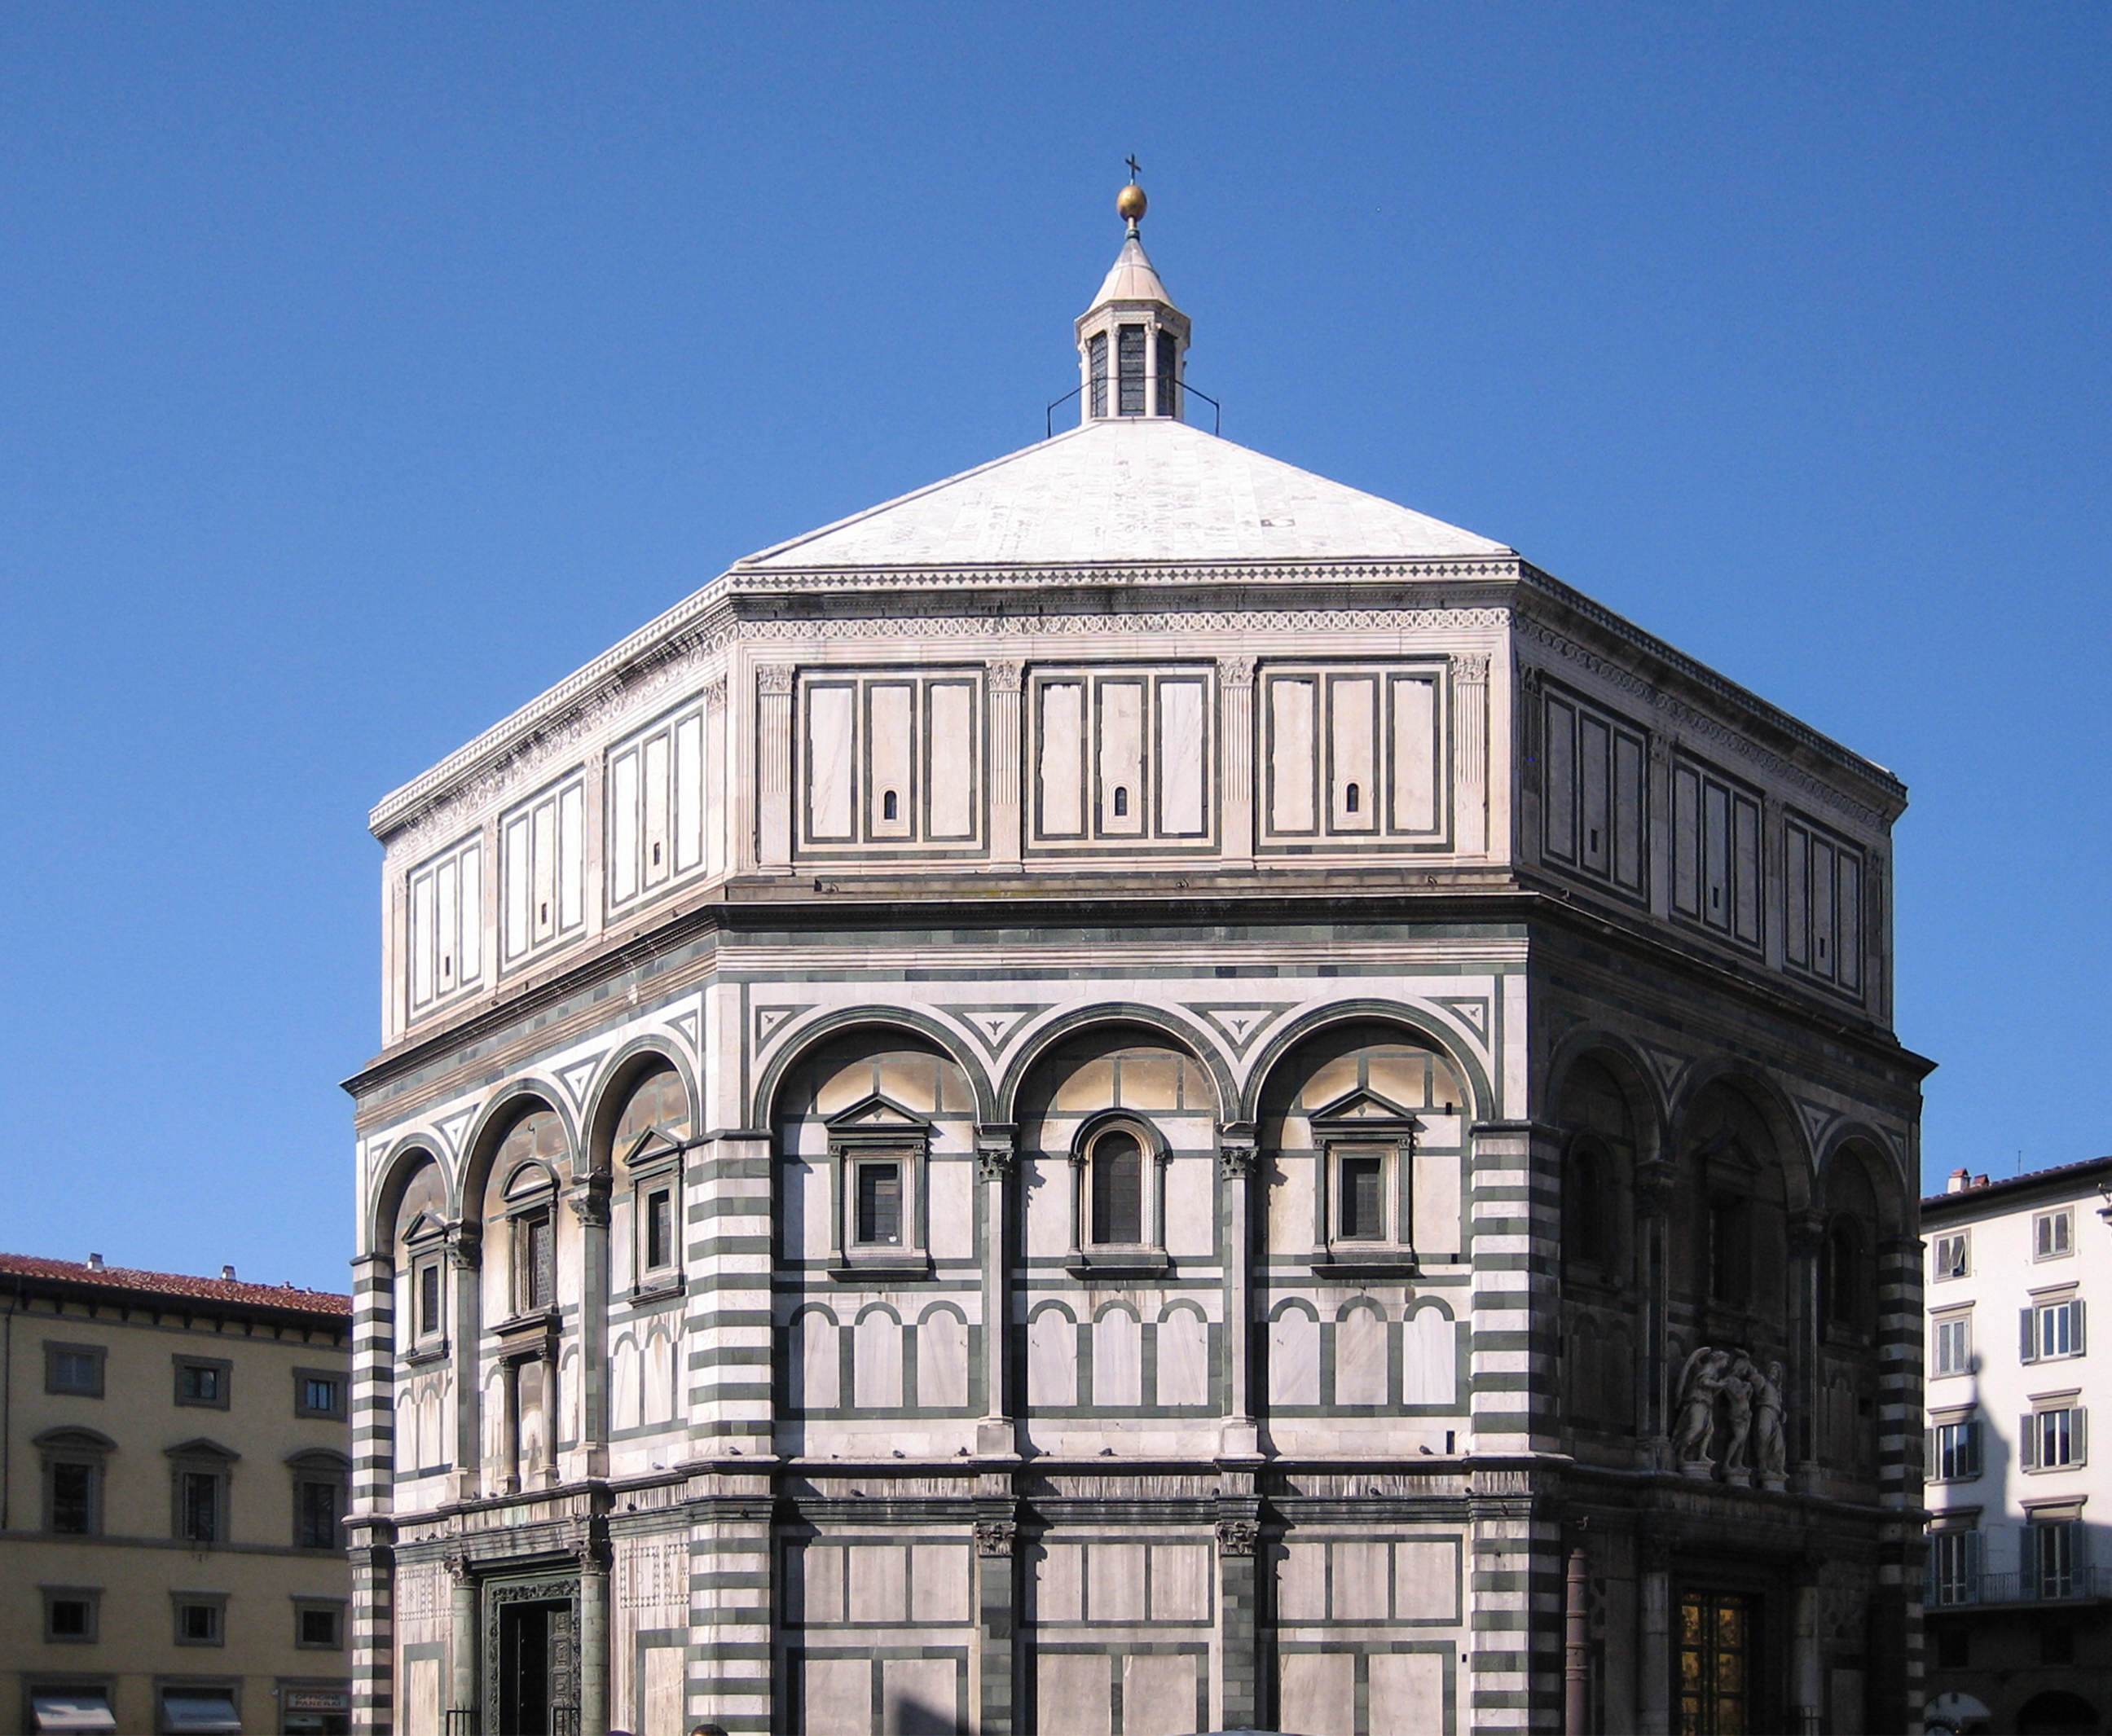 Duomo 5 dicas Viaje Global